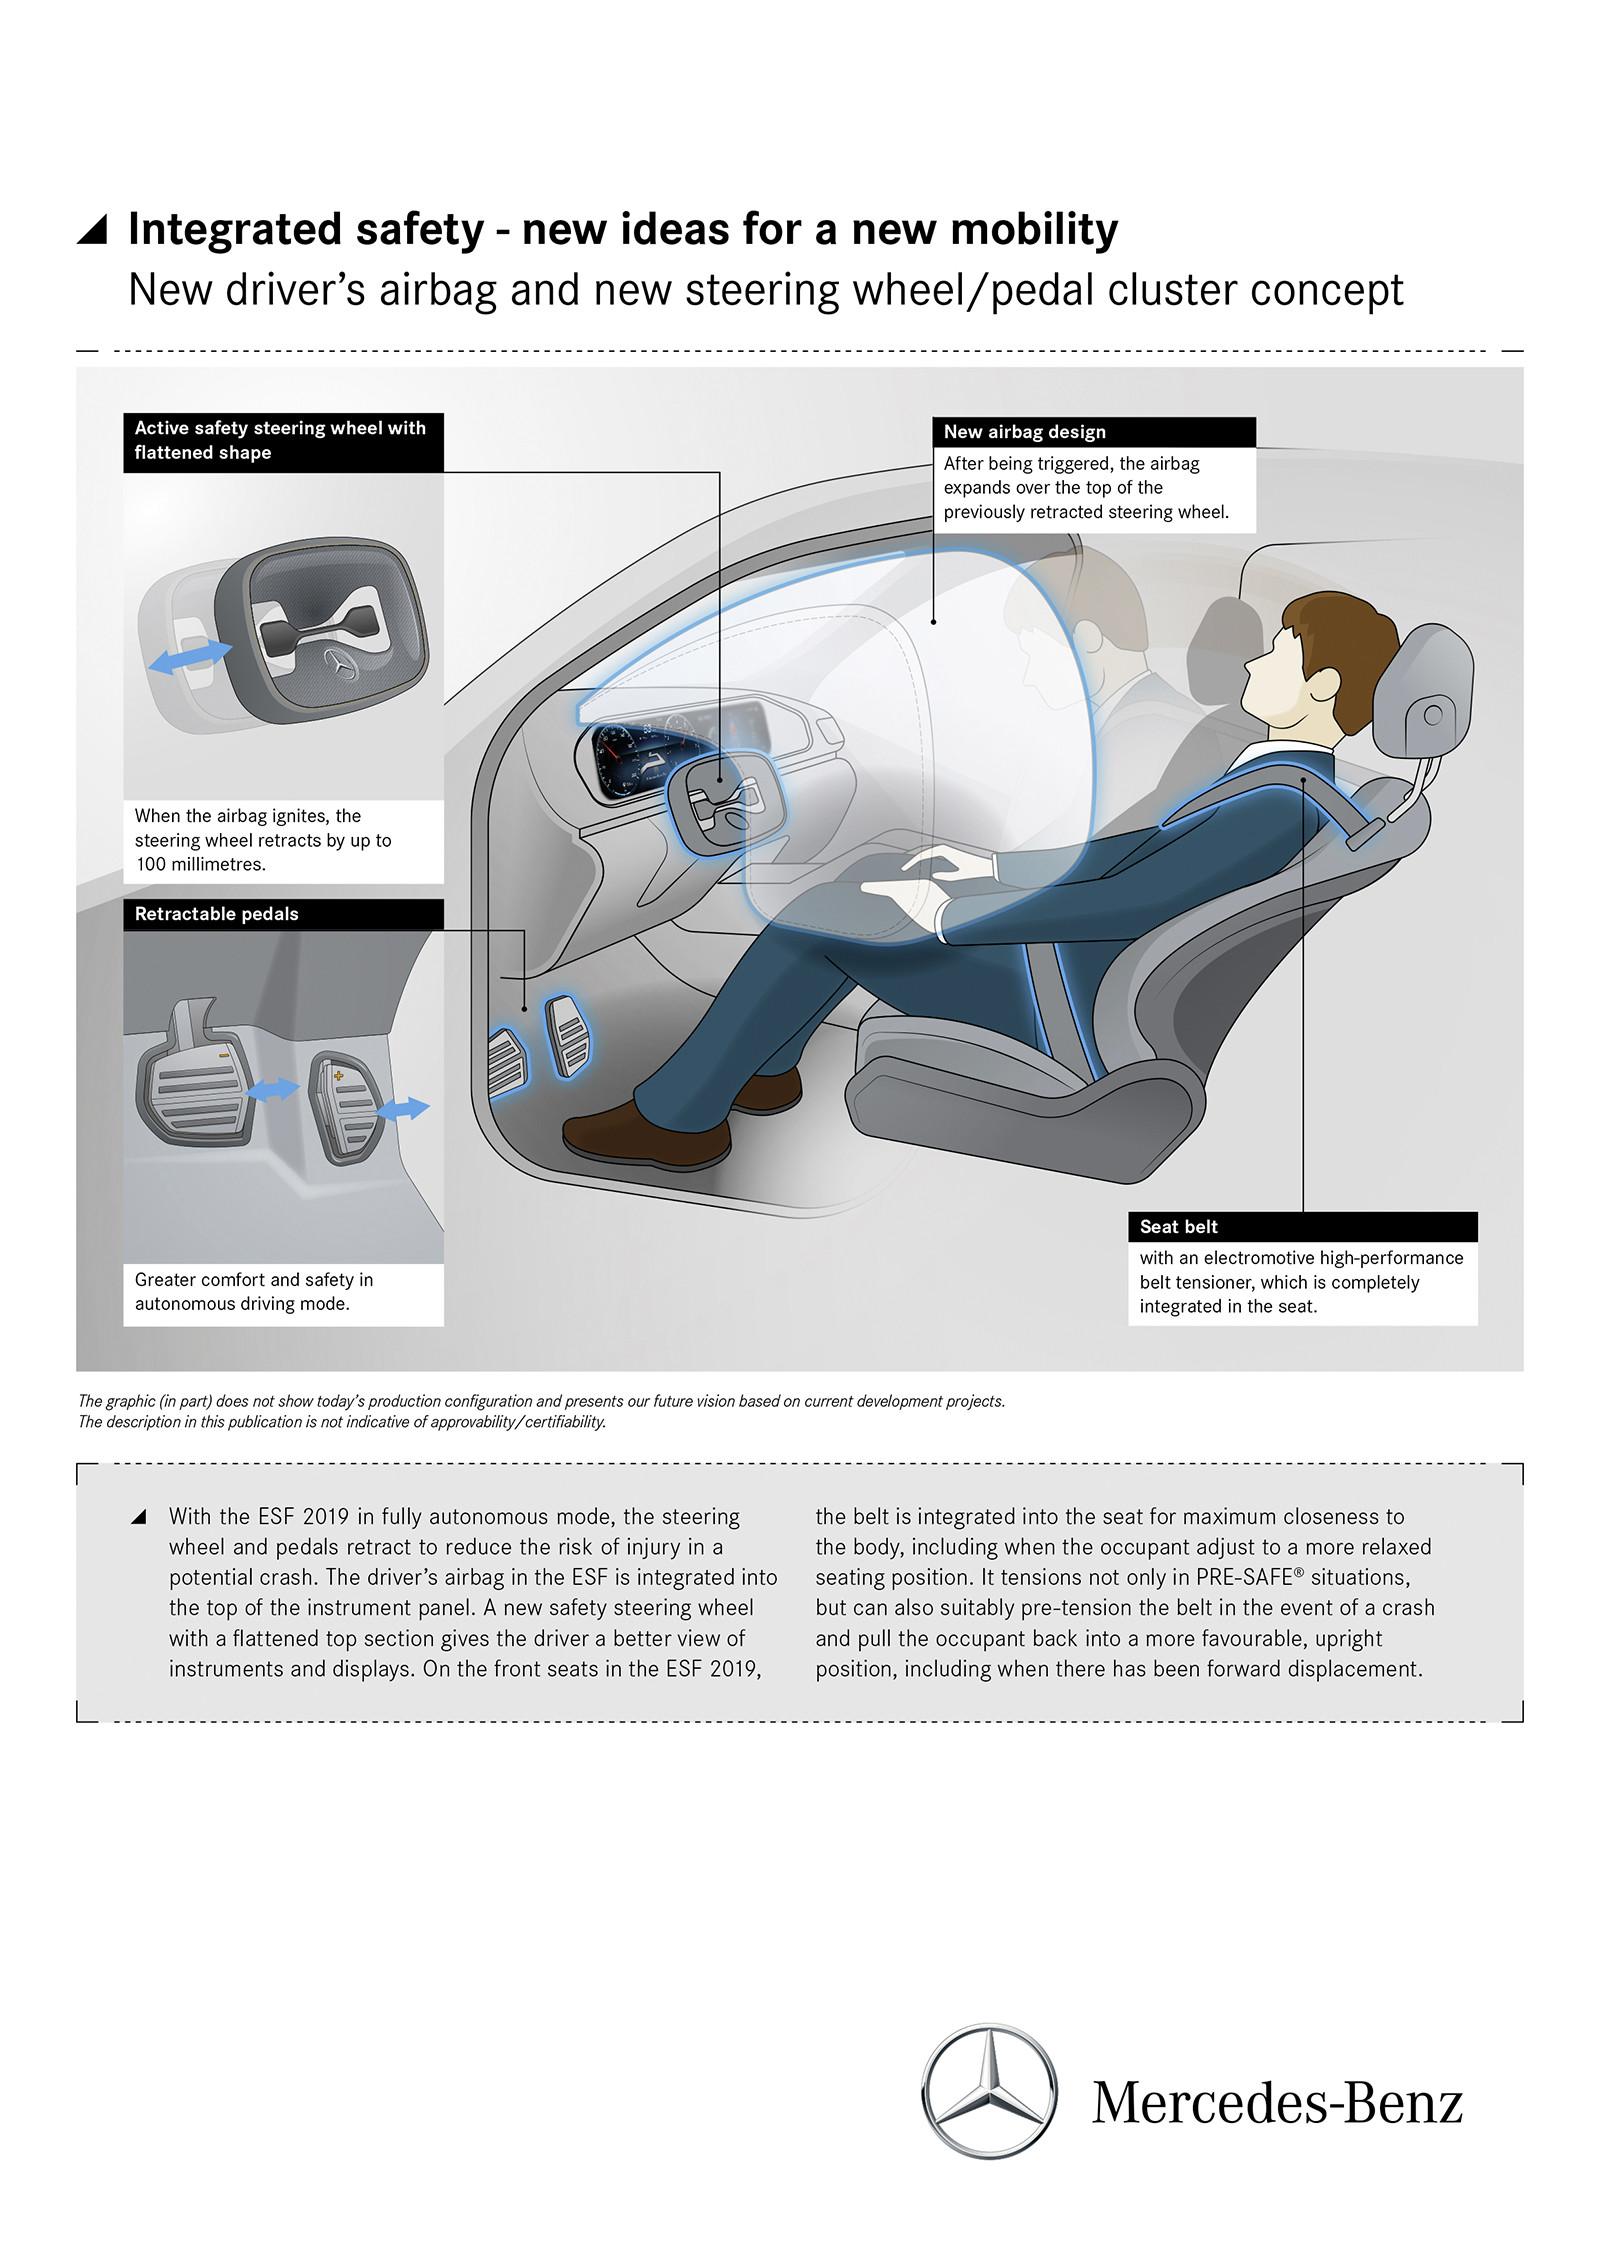 Mercedes-Benz Experimental Safety Vehicle